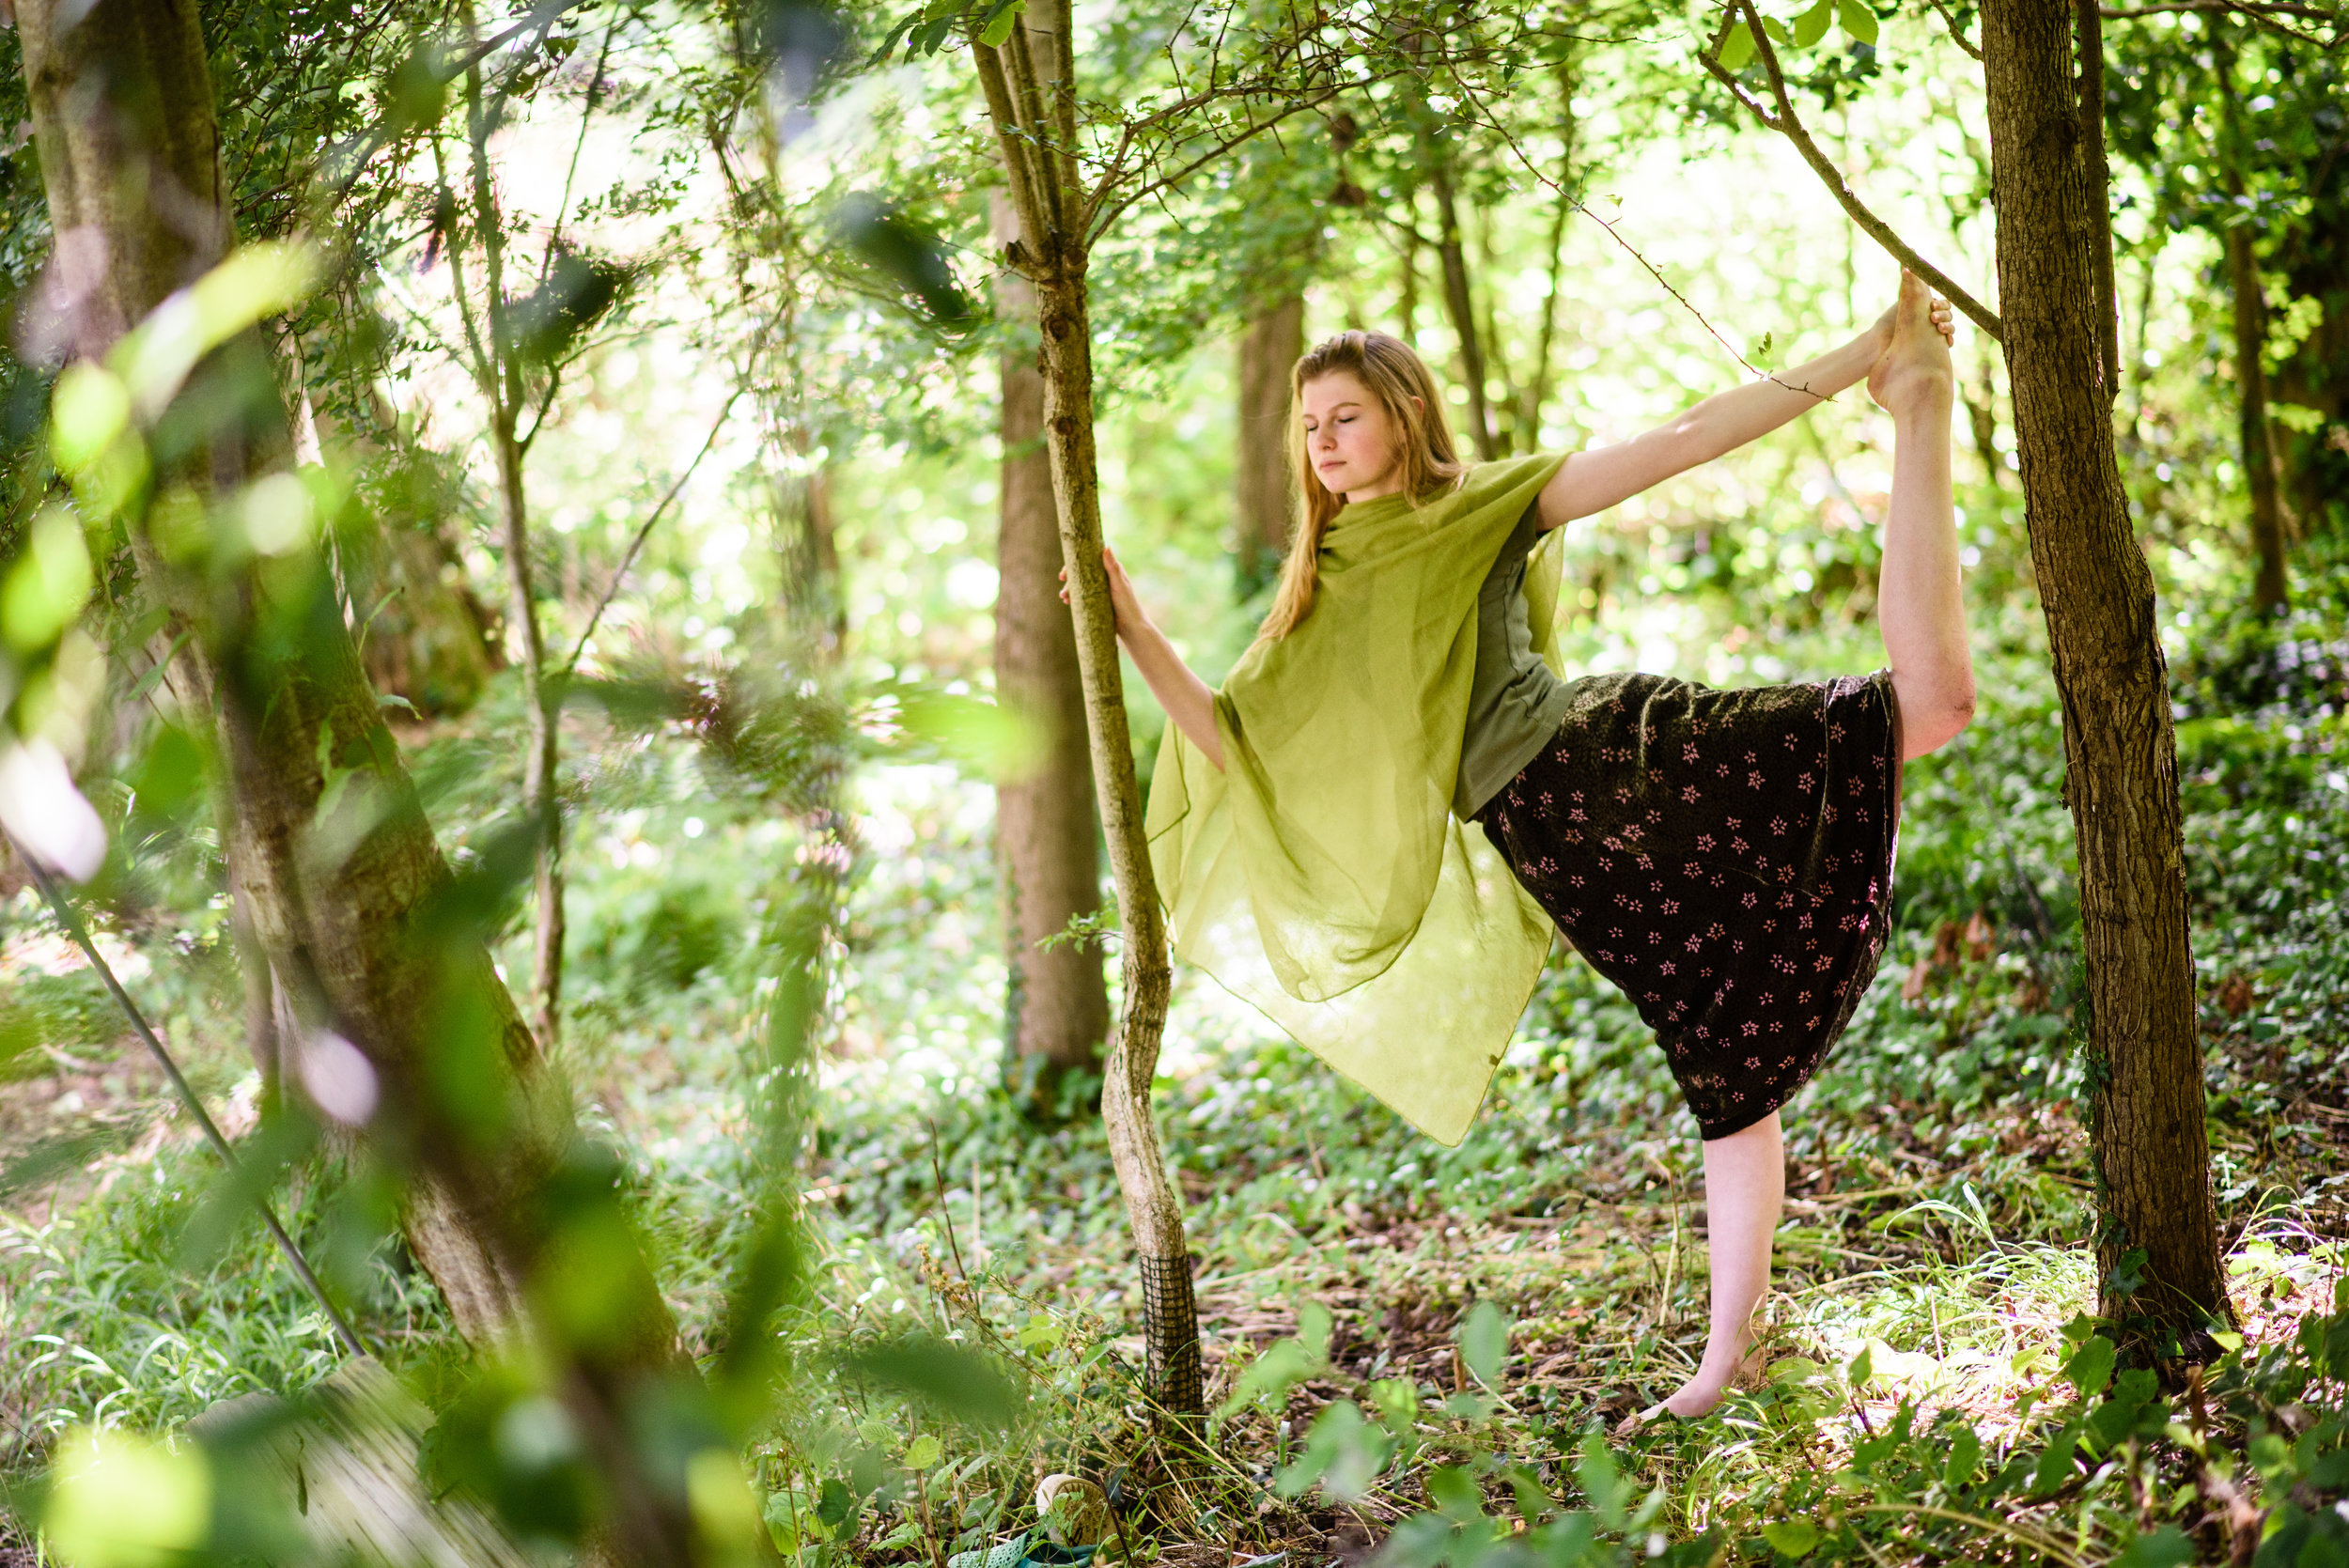 Beinspired Yoga_ Green Nature_31.JPG